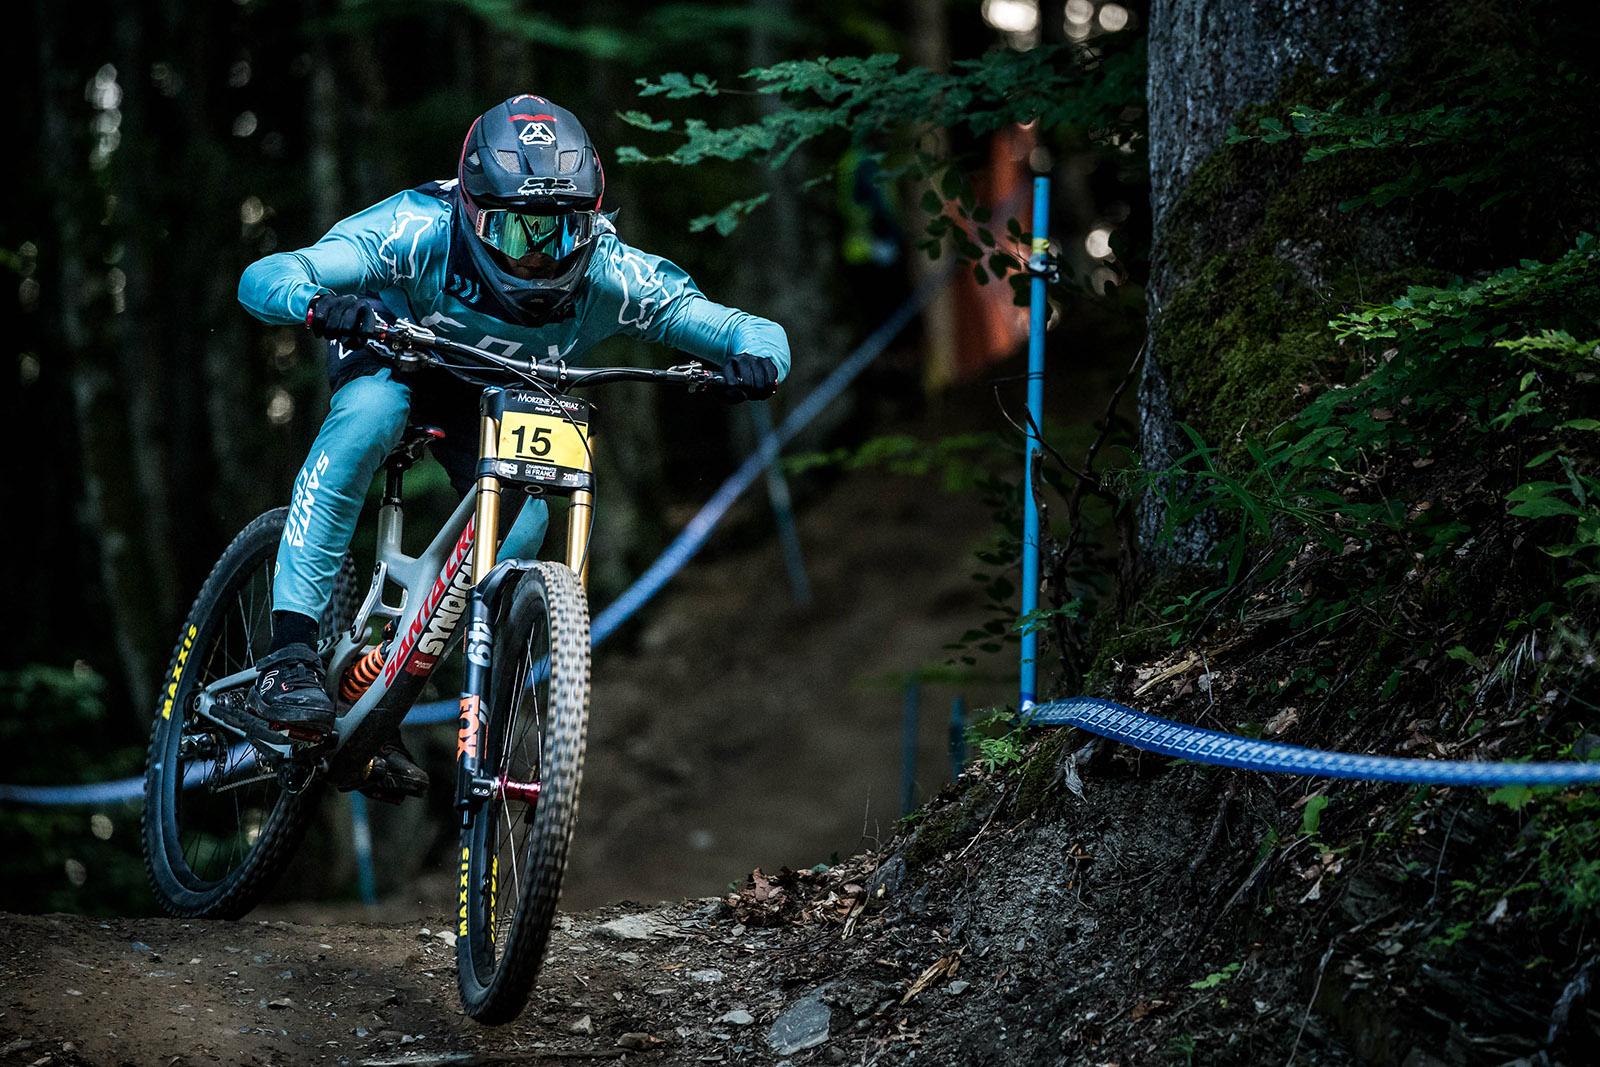 Santa Cruz Bicycles - The Santa Cruz Syndicate's Loris Vergier in Morzine for 2018 French National DH Championships